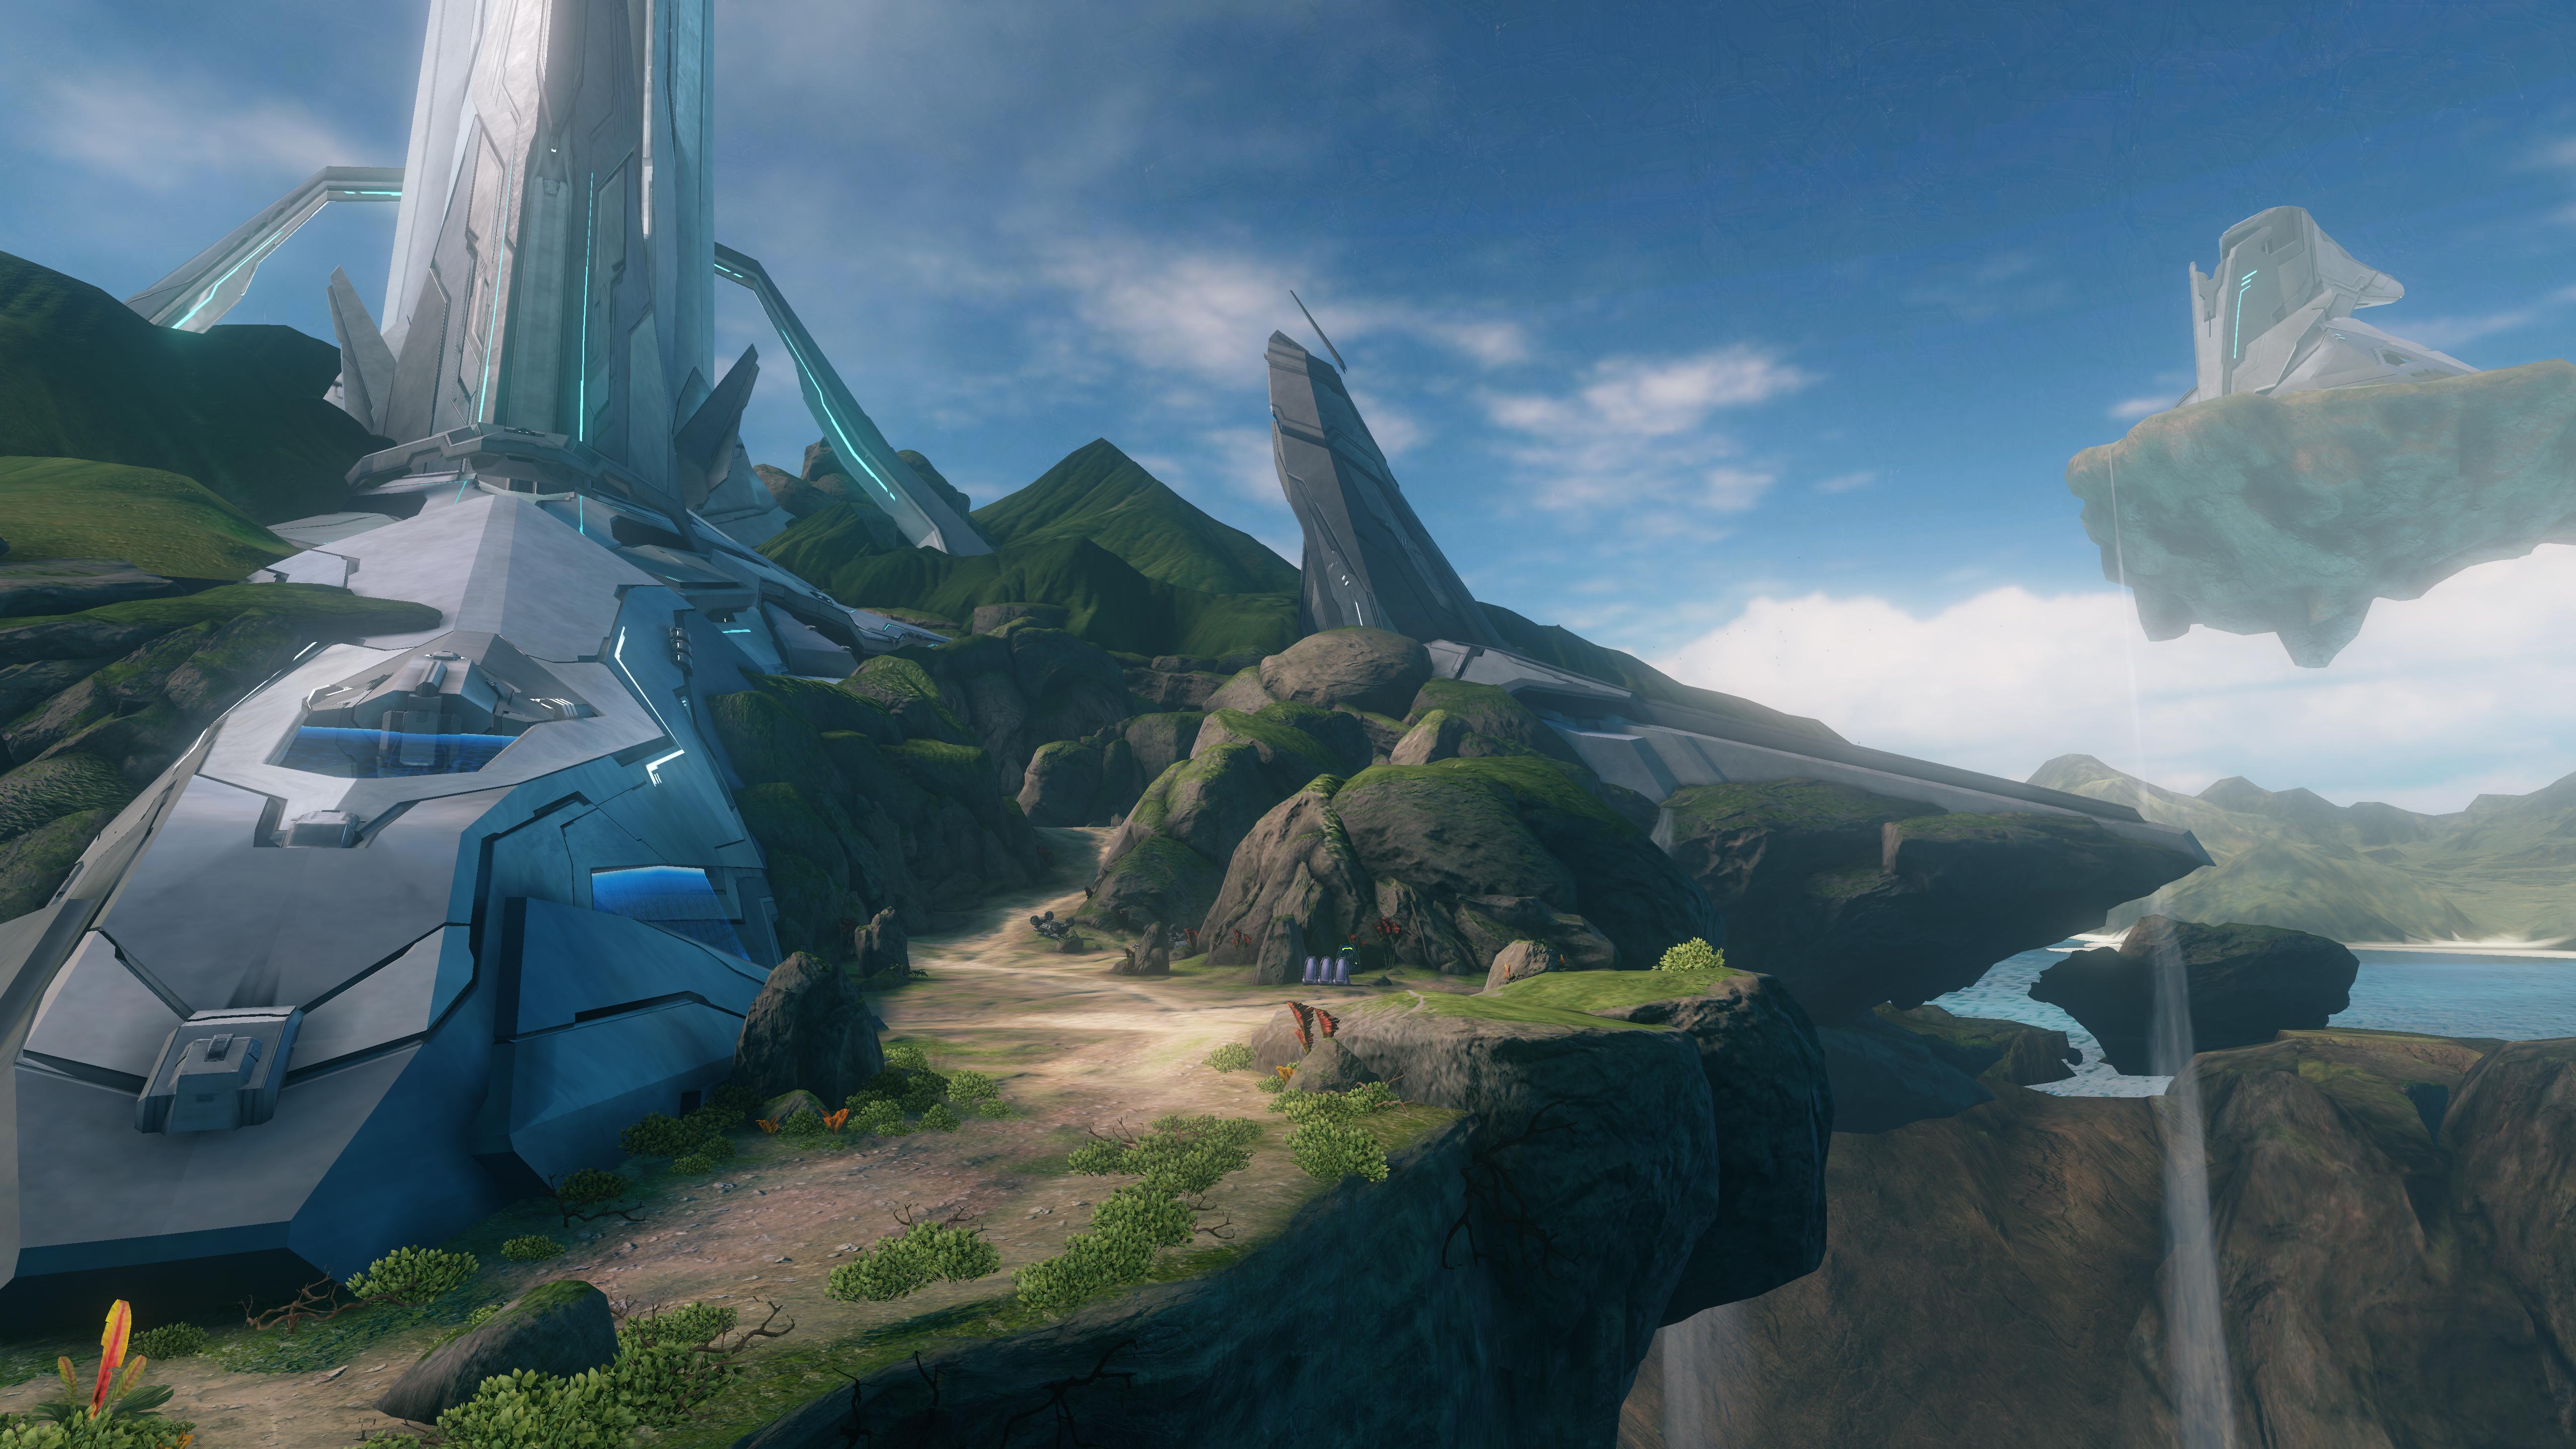 Halo 4 Spartan Ops Episode 4 Video